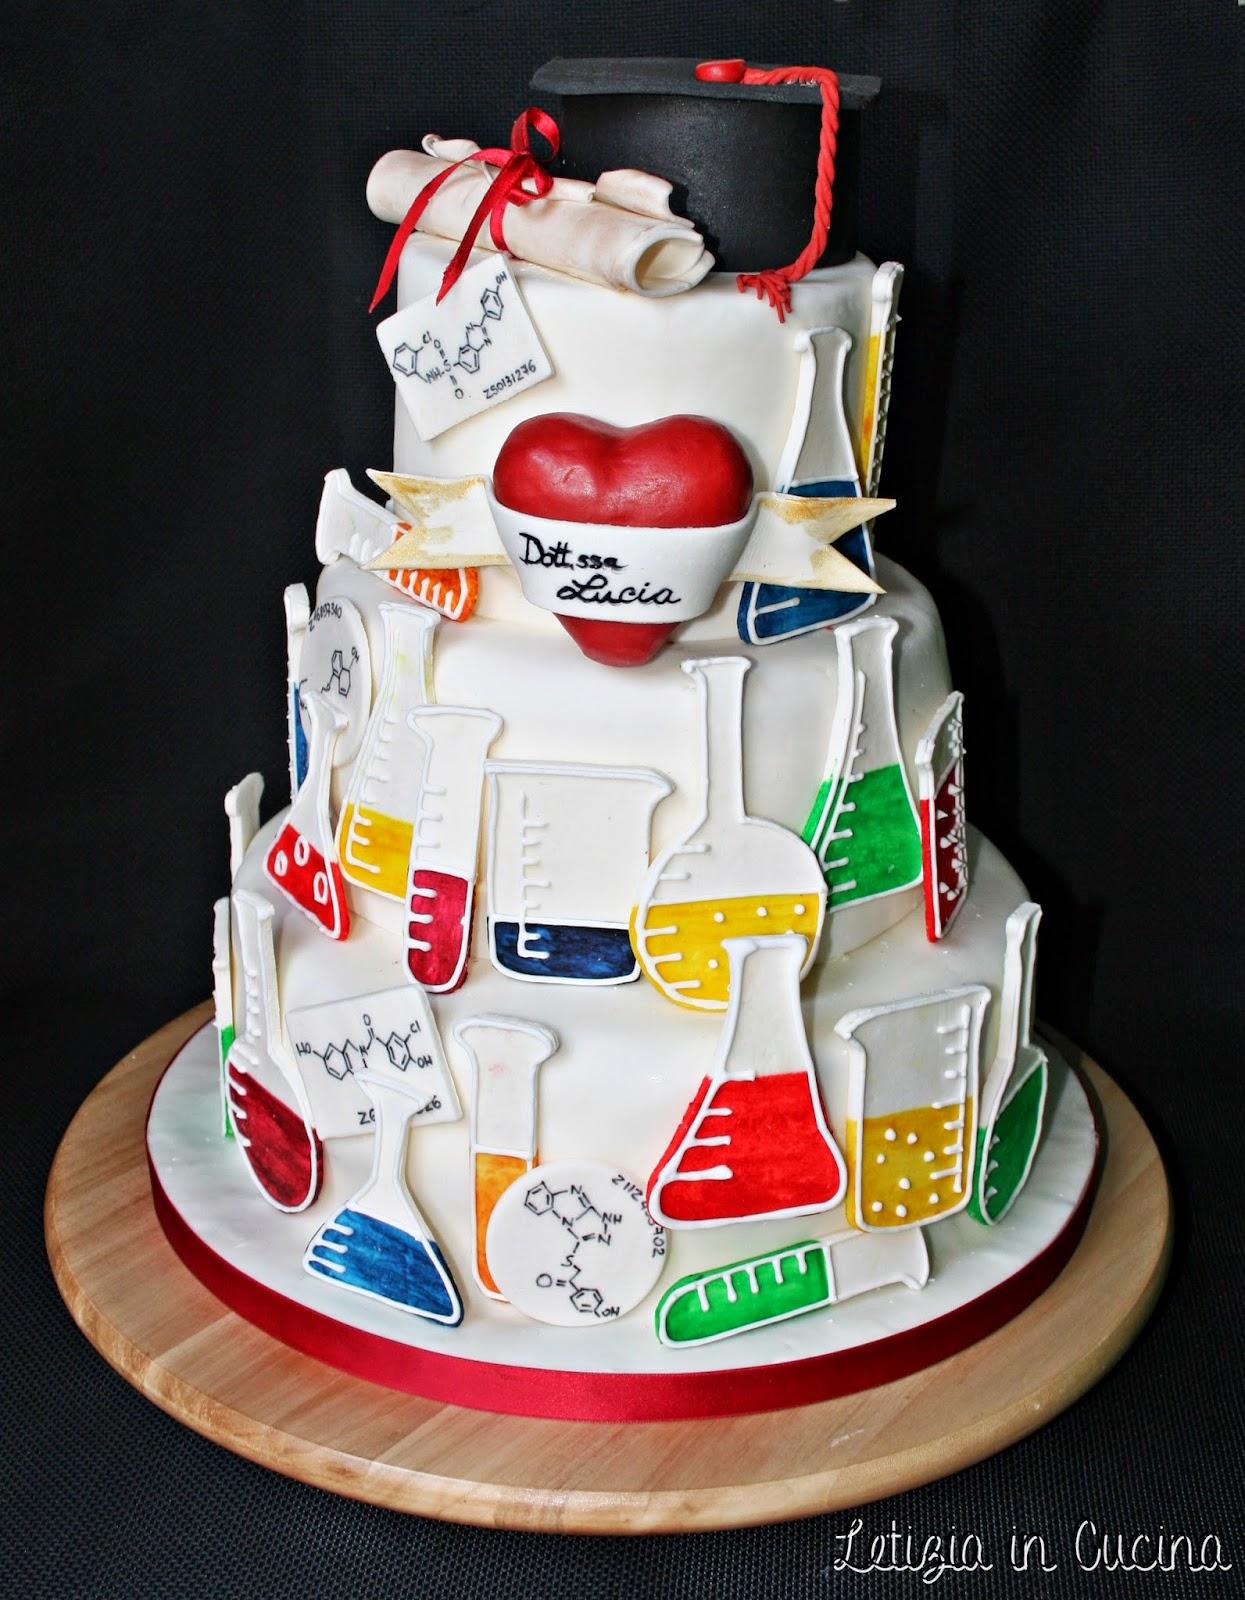 Cake Design In Kl : Letizia in Cucina: Torta Laurea Lucia (2)